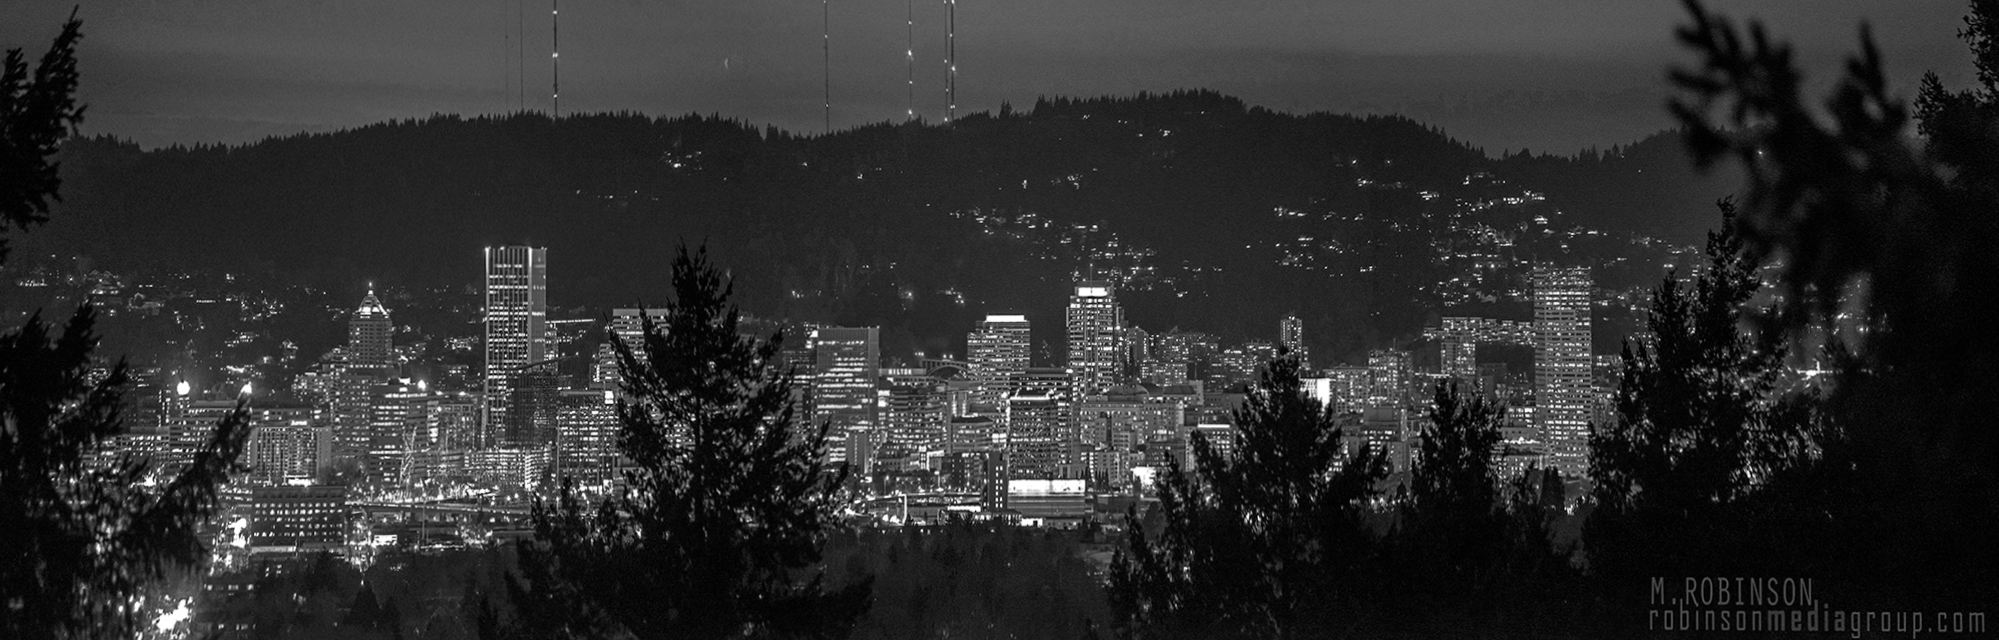 landscape_portland_cityscape_night_mttabor.jpg